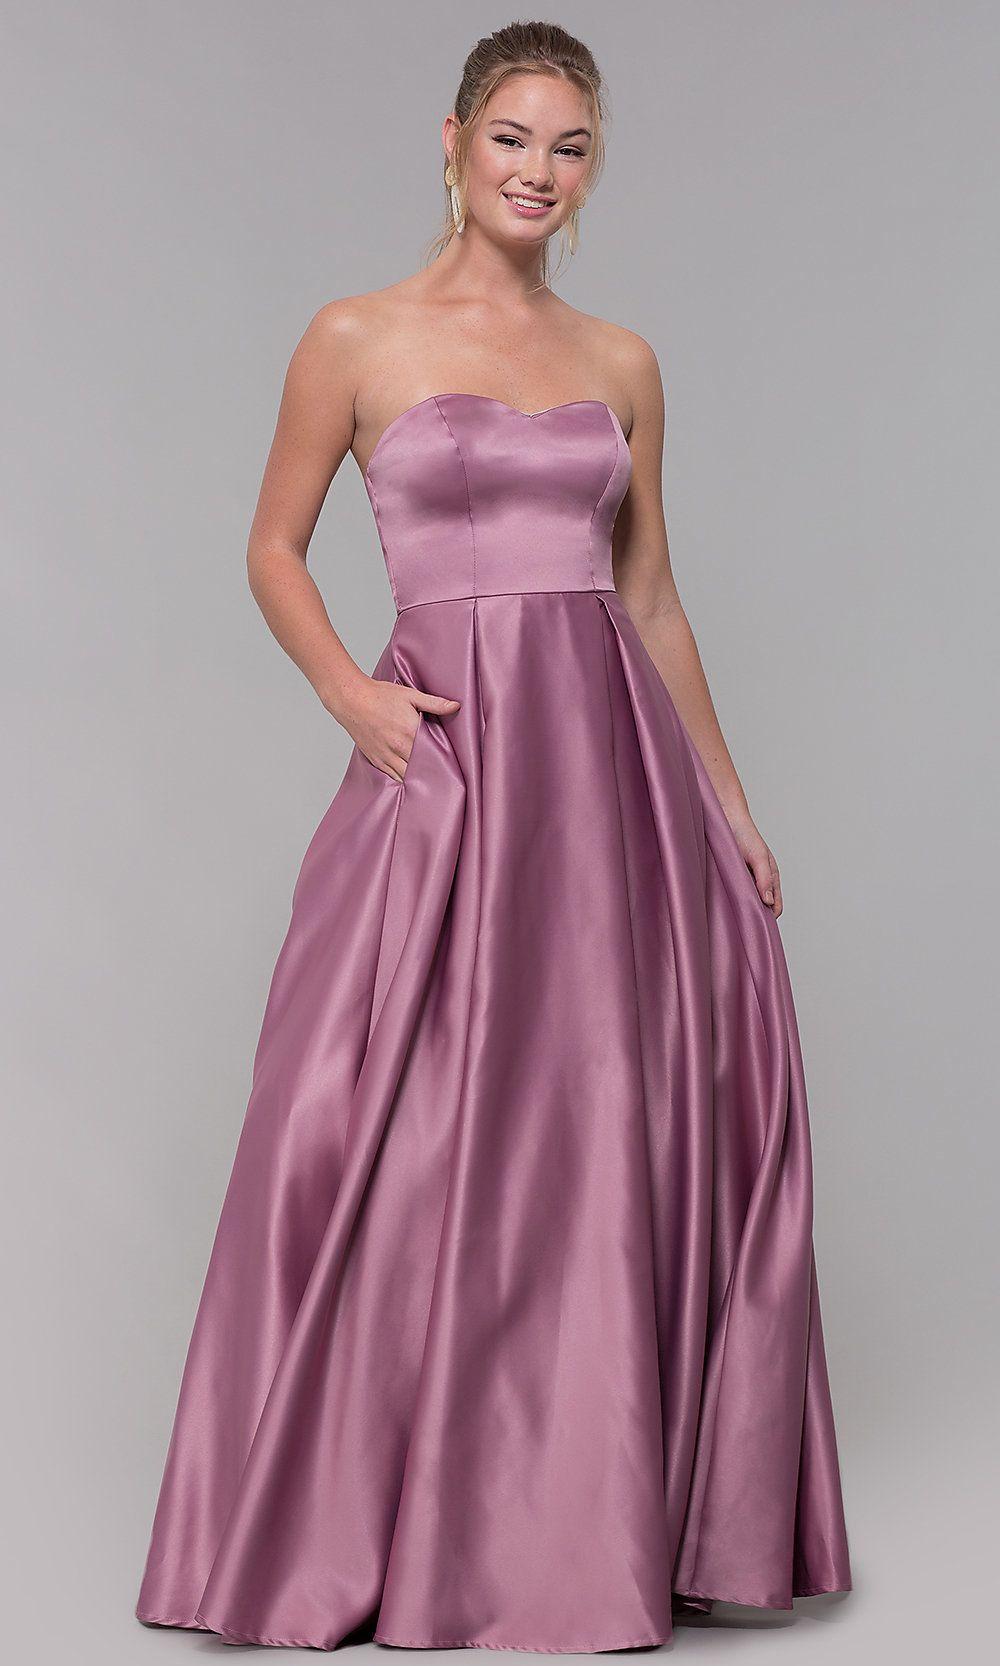 Strapless Long Sweetheart Satin Prom Dress Strapless Dress Formal Prom Dresses Satin Prom Dress [ 1666 x 1000 Pixel ]